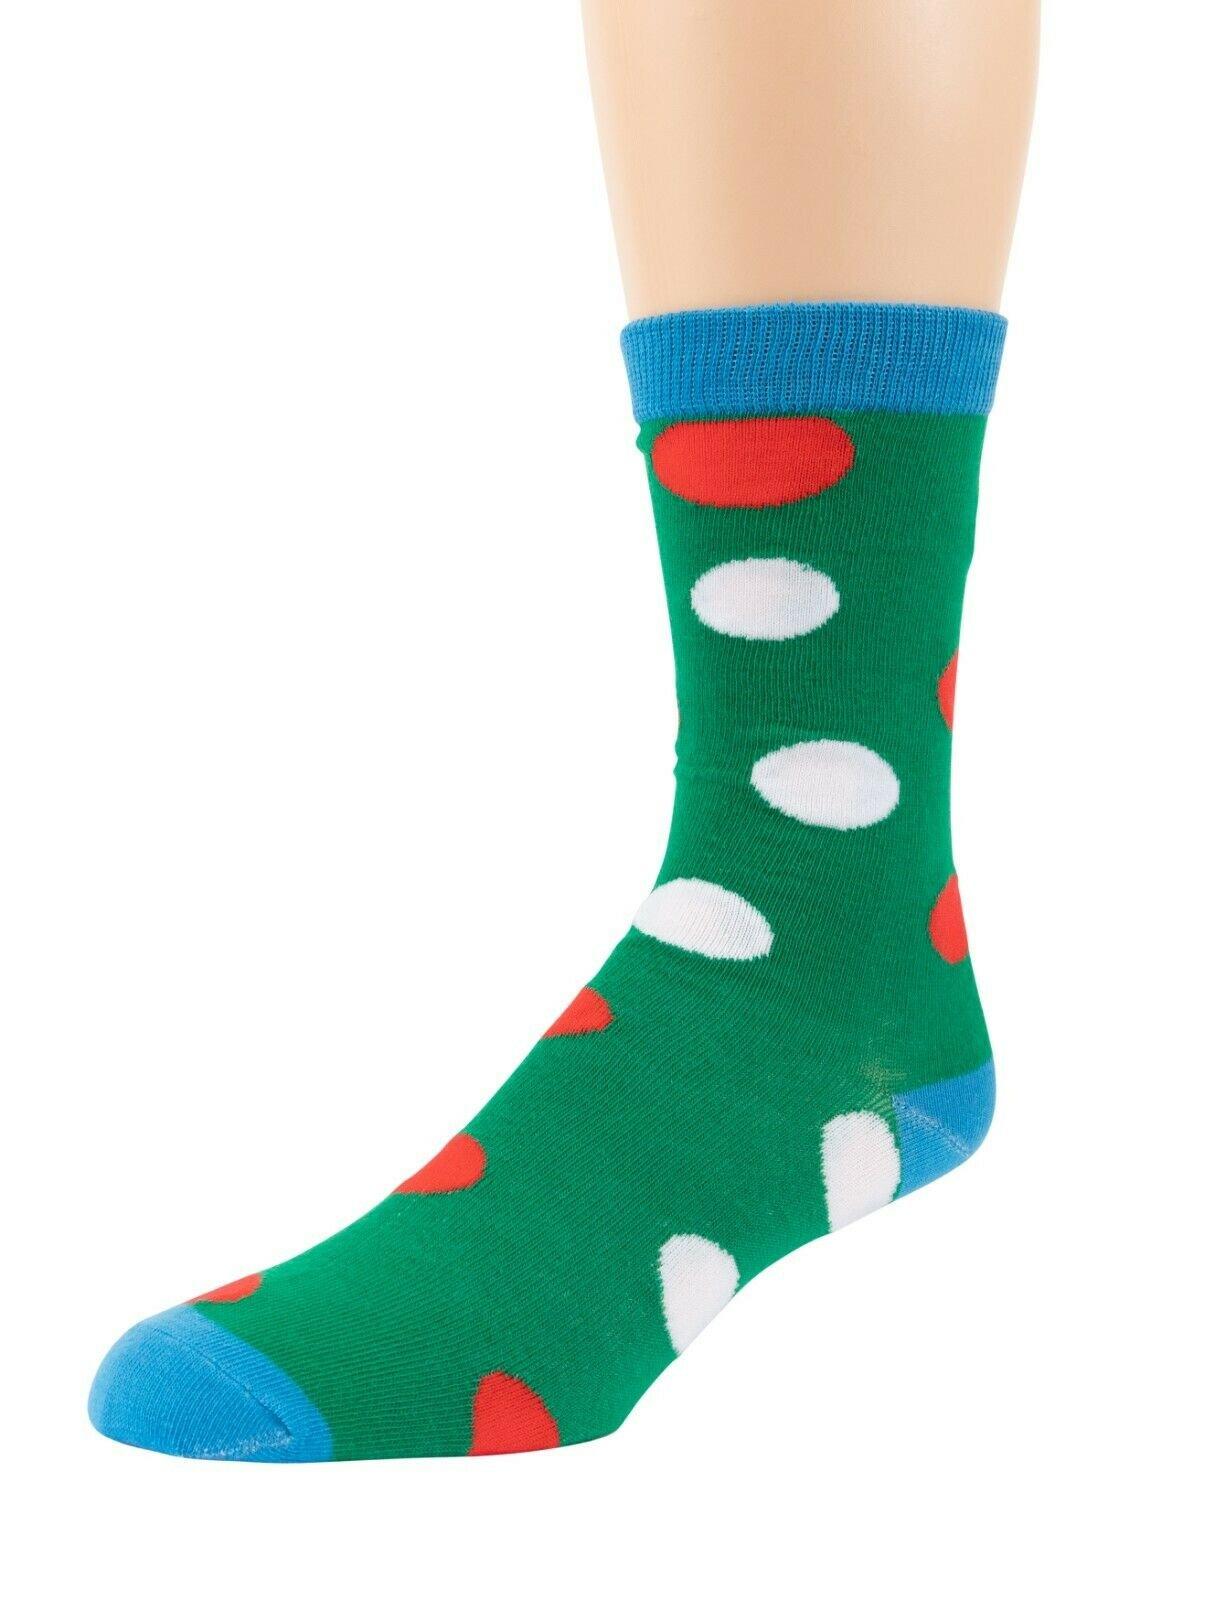 Mitch-Bogen-Mens-Cotton-Dress-Socks-Colorful-Fashion-Crew-Socks-8-Pack-Gift-Box thumbnail 10